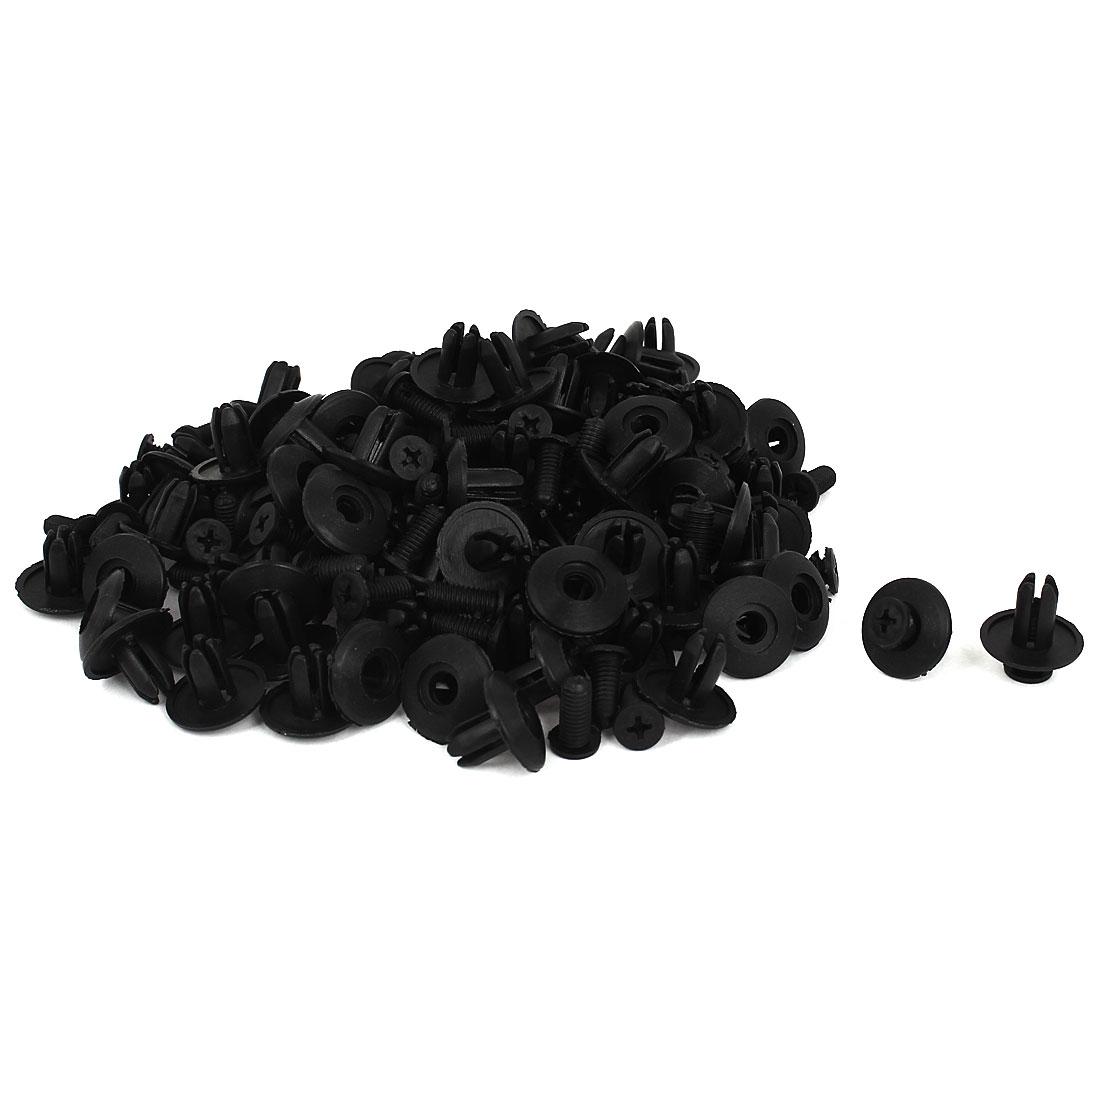 100 Pcs Black Plastic Rivet Trim Fastener Moulding Clips 7mm x 13mm x 20mm